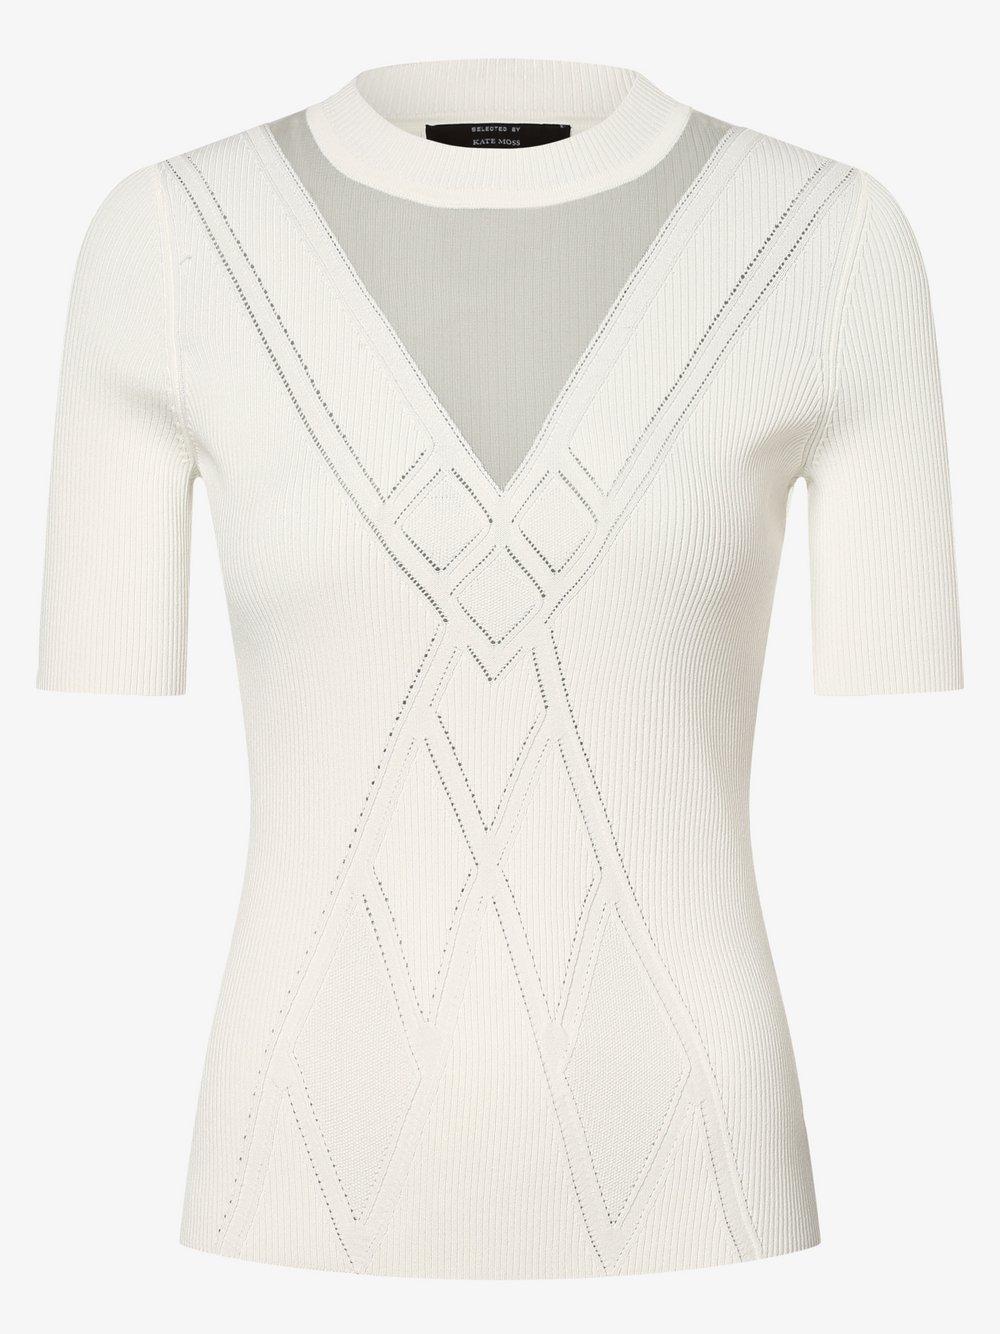 NIKKIE – Koszulka damska – Gigi, biały Van Graaf 477629-0002-00380